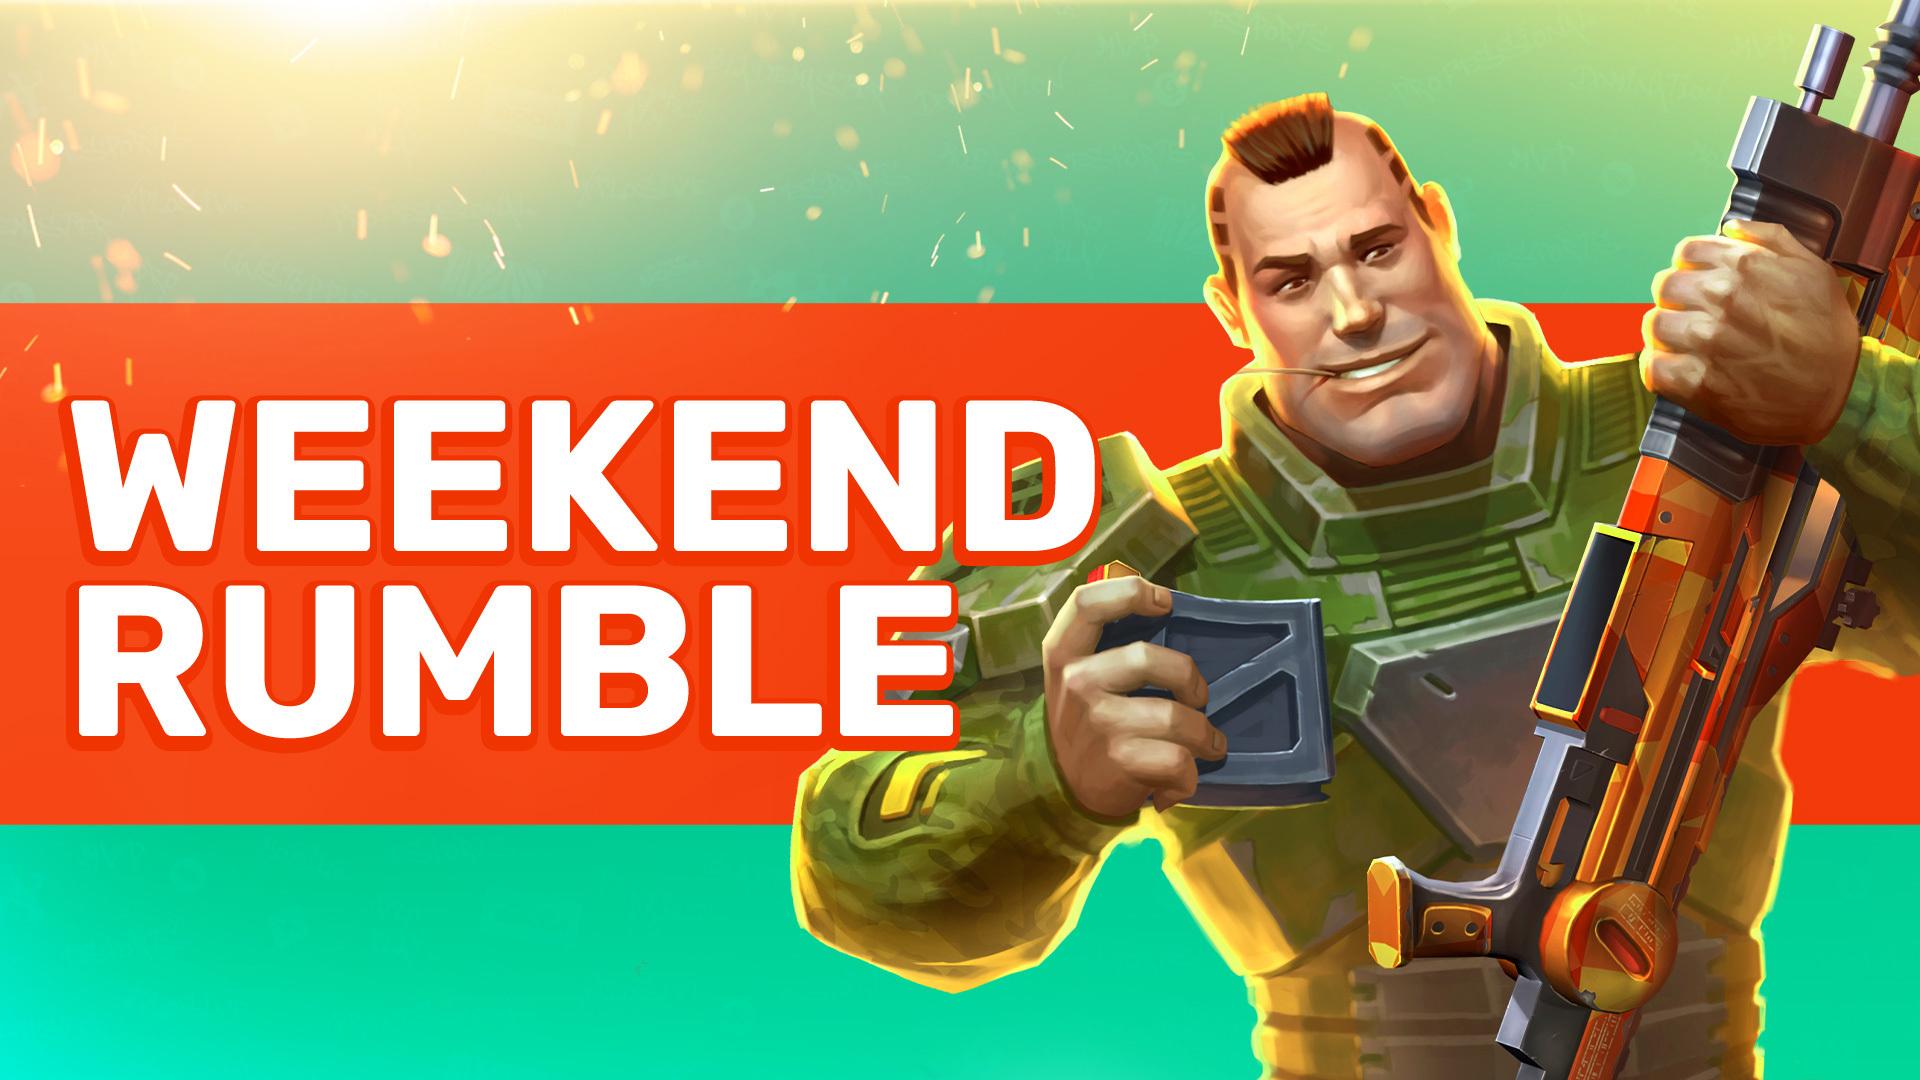 600720a9431ed_WeekendRumble_header_1920x1080